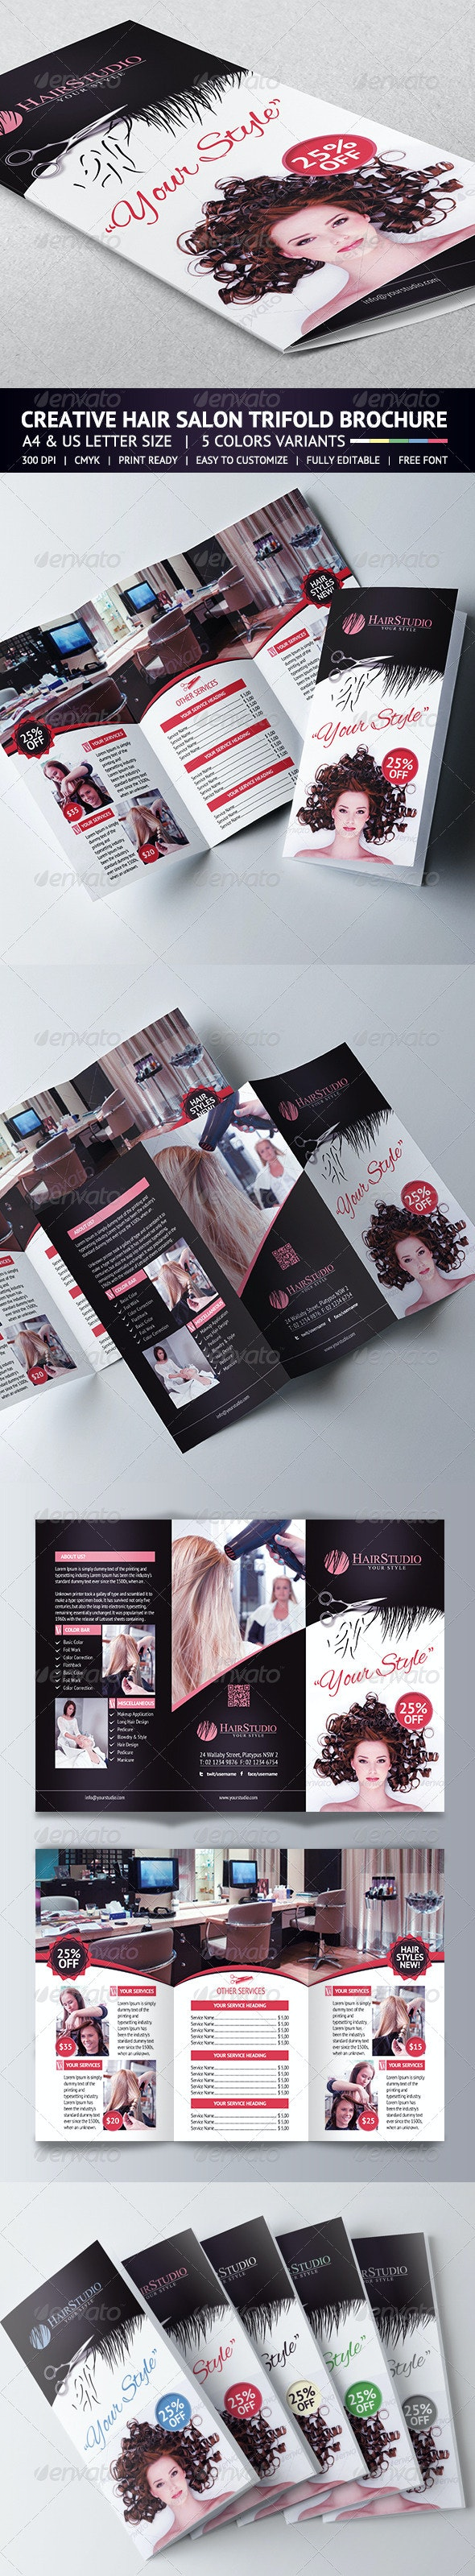 Hair Salon Trifold Brochure - Corporate Brochures